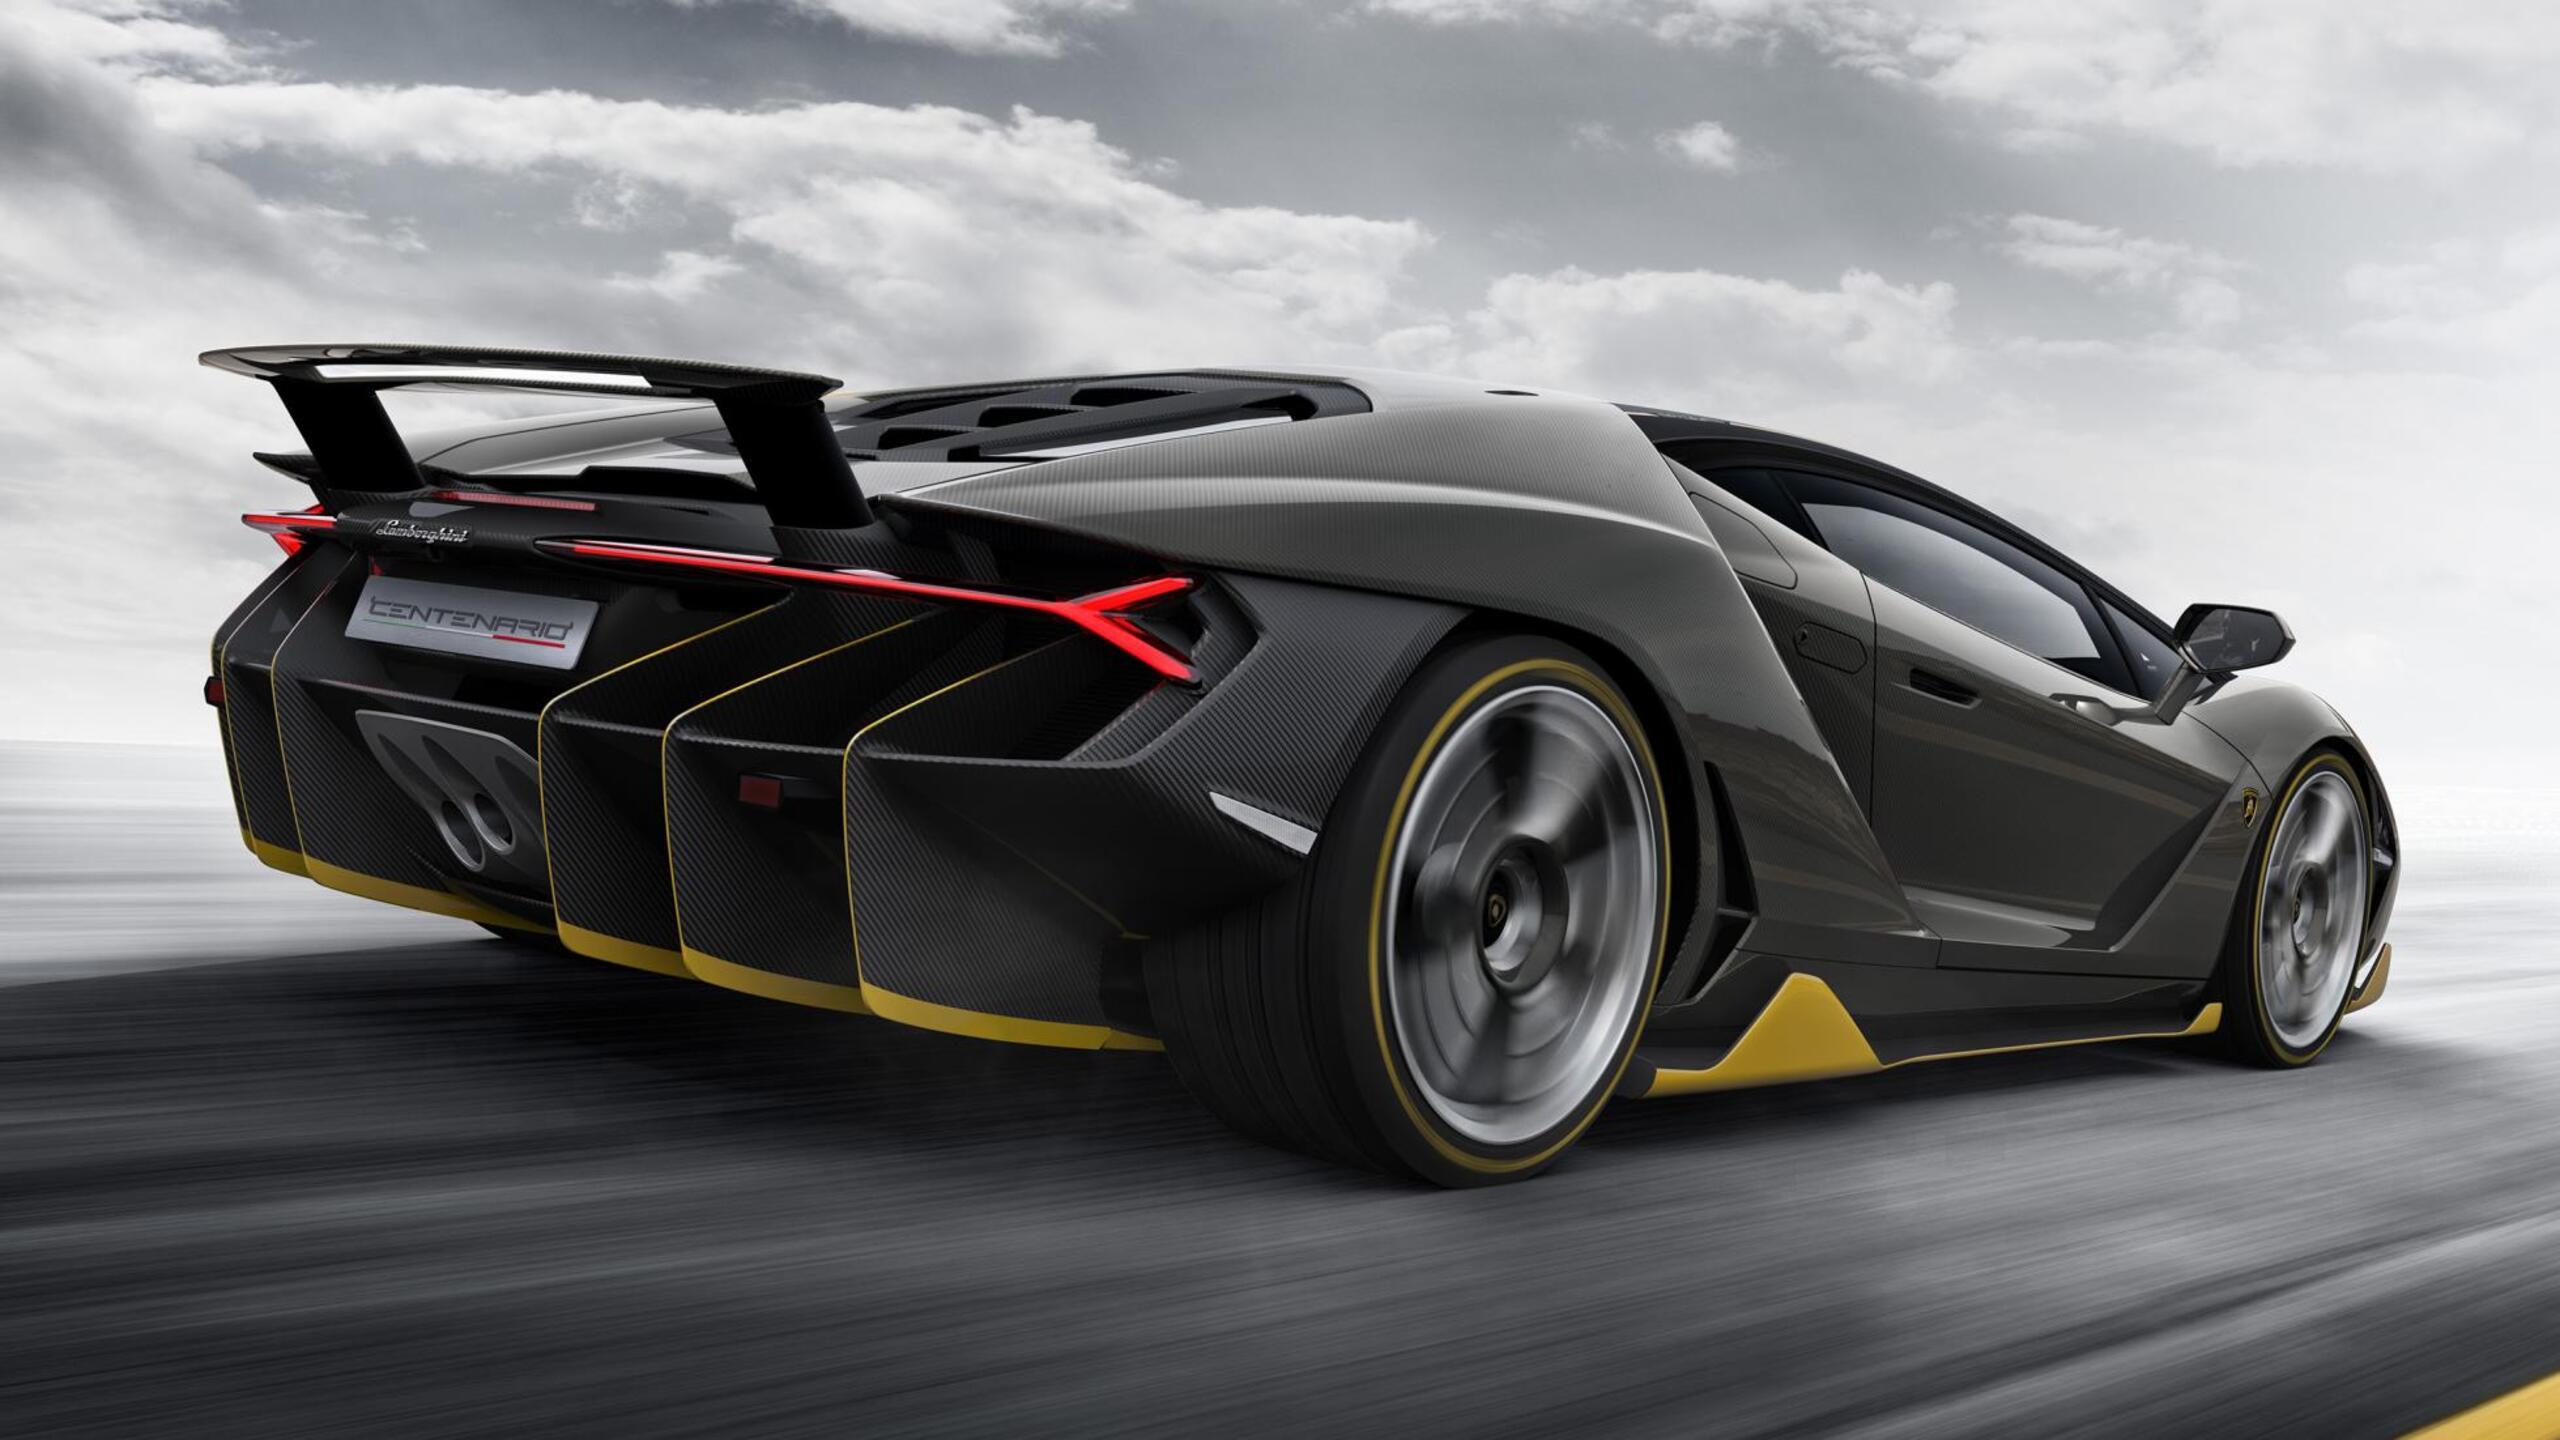 2560x1440 Lamborghini Centenario 1440P Resolution HD 4k Wallpapers